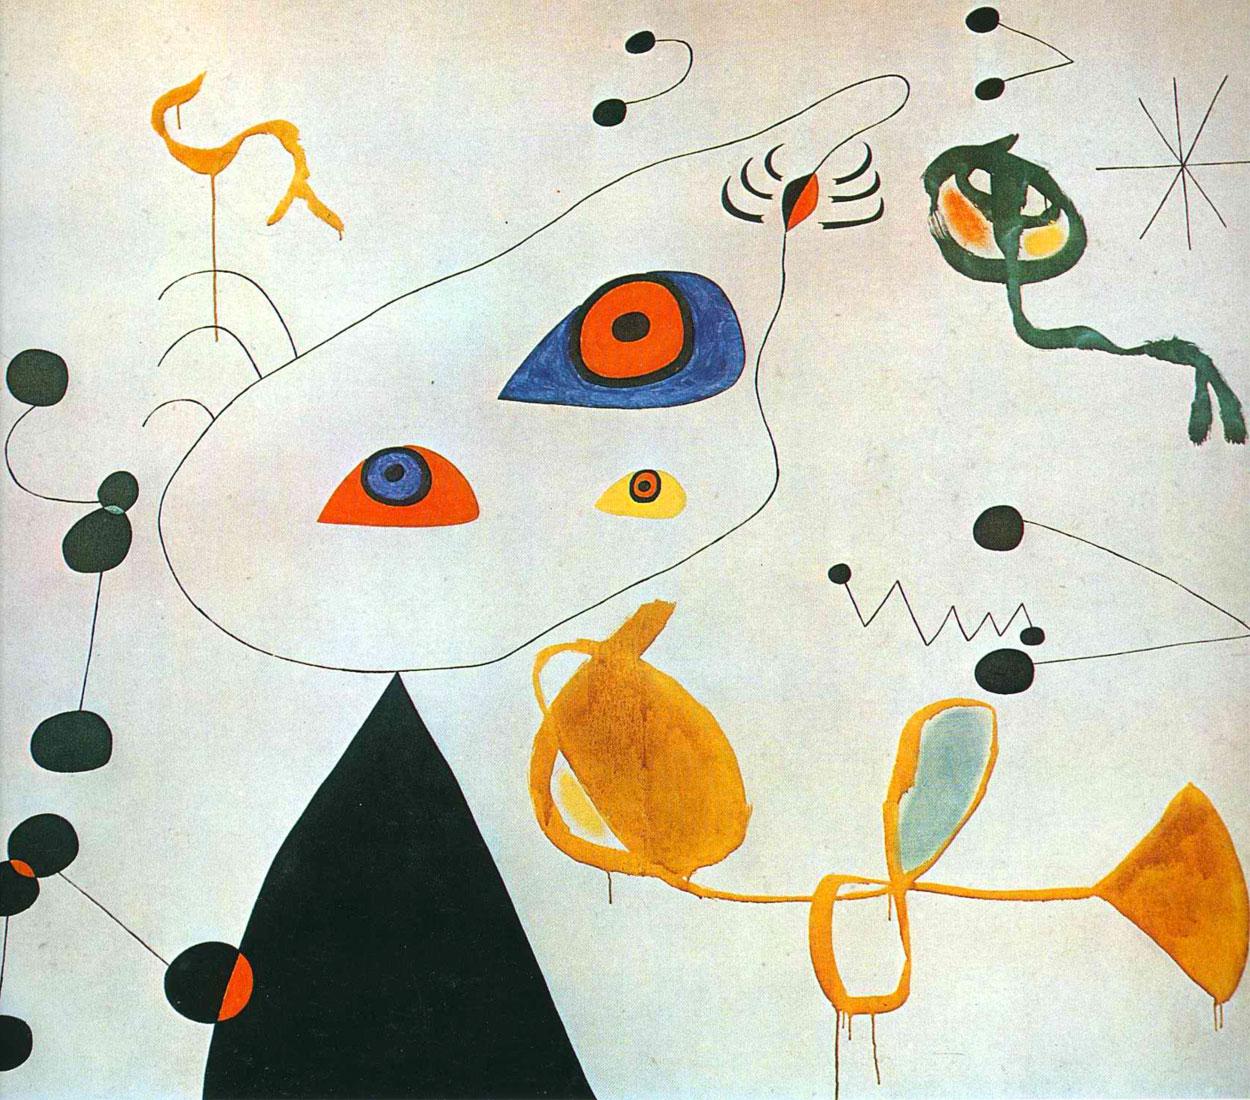 Donne e uccelli nella notte - Joan Miró - 1971-1975